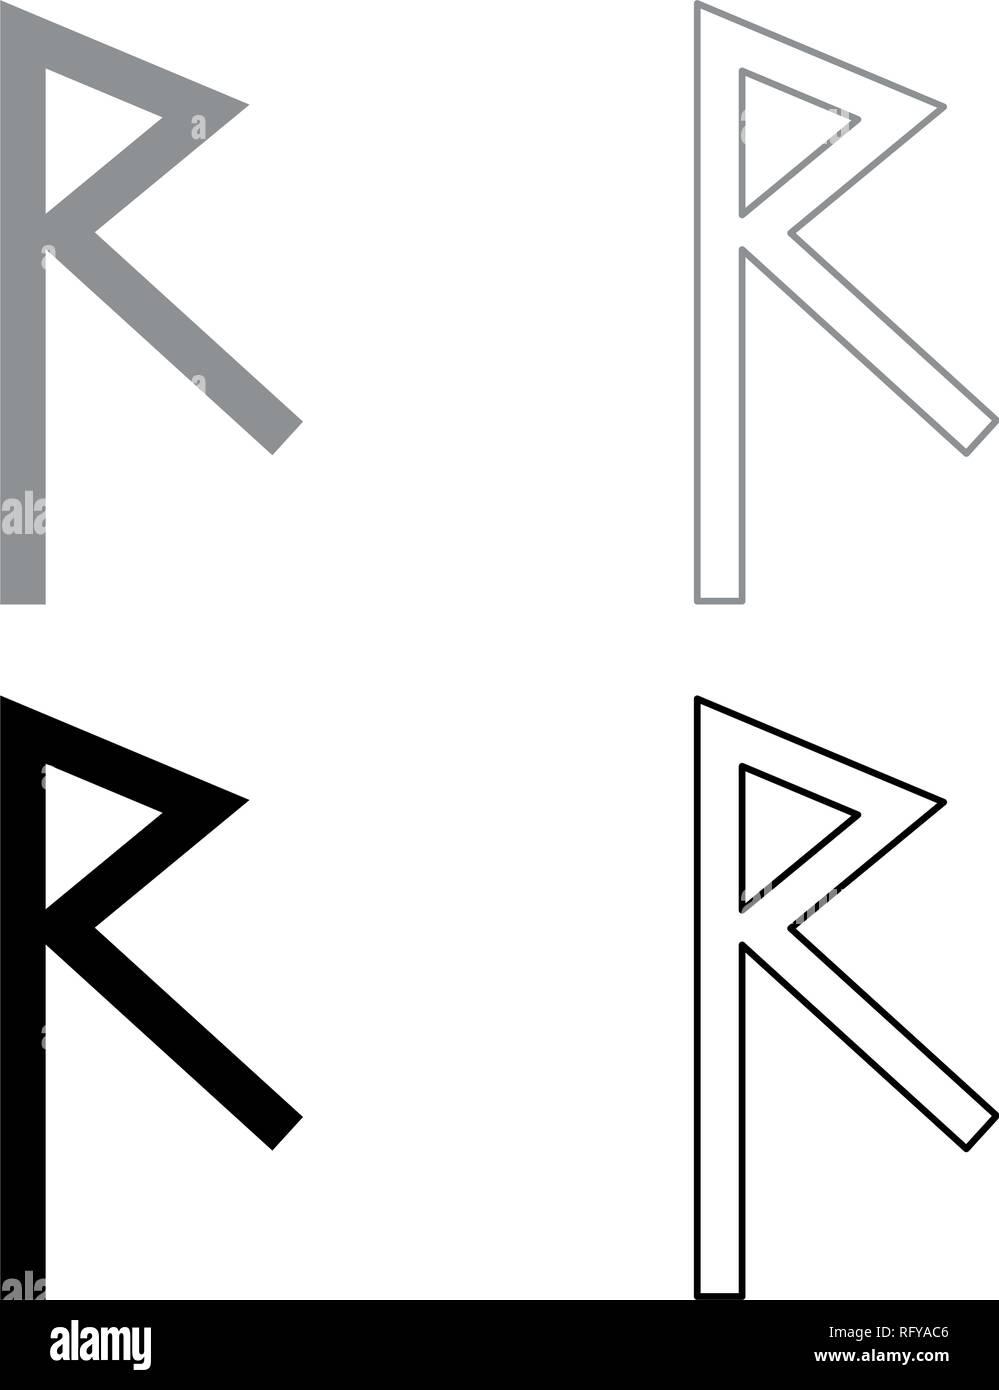 Raido rune raid symbol road icon set grey black color vector I outline flat style simple image - Stock Vector